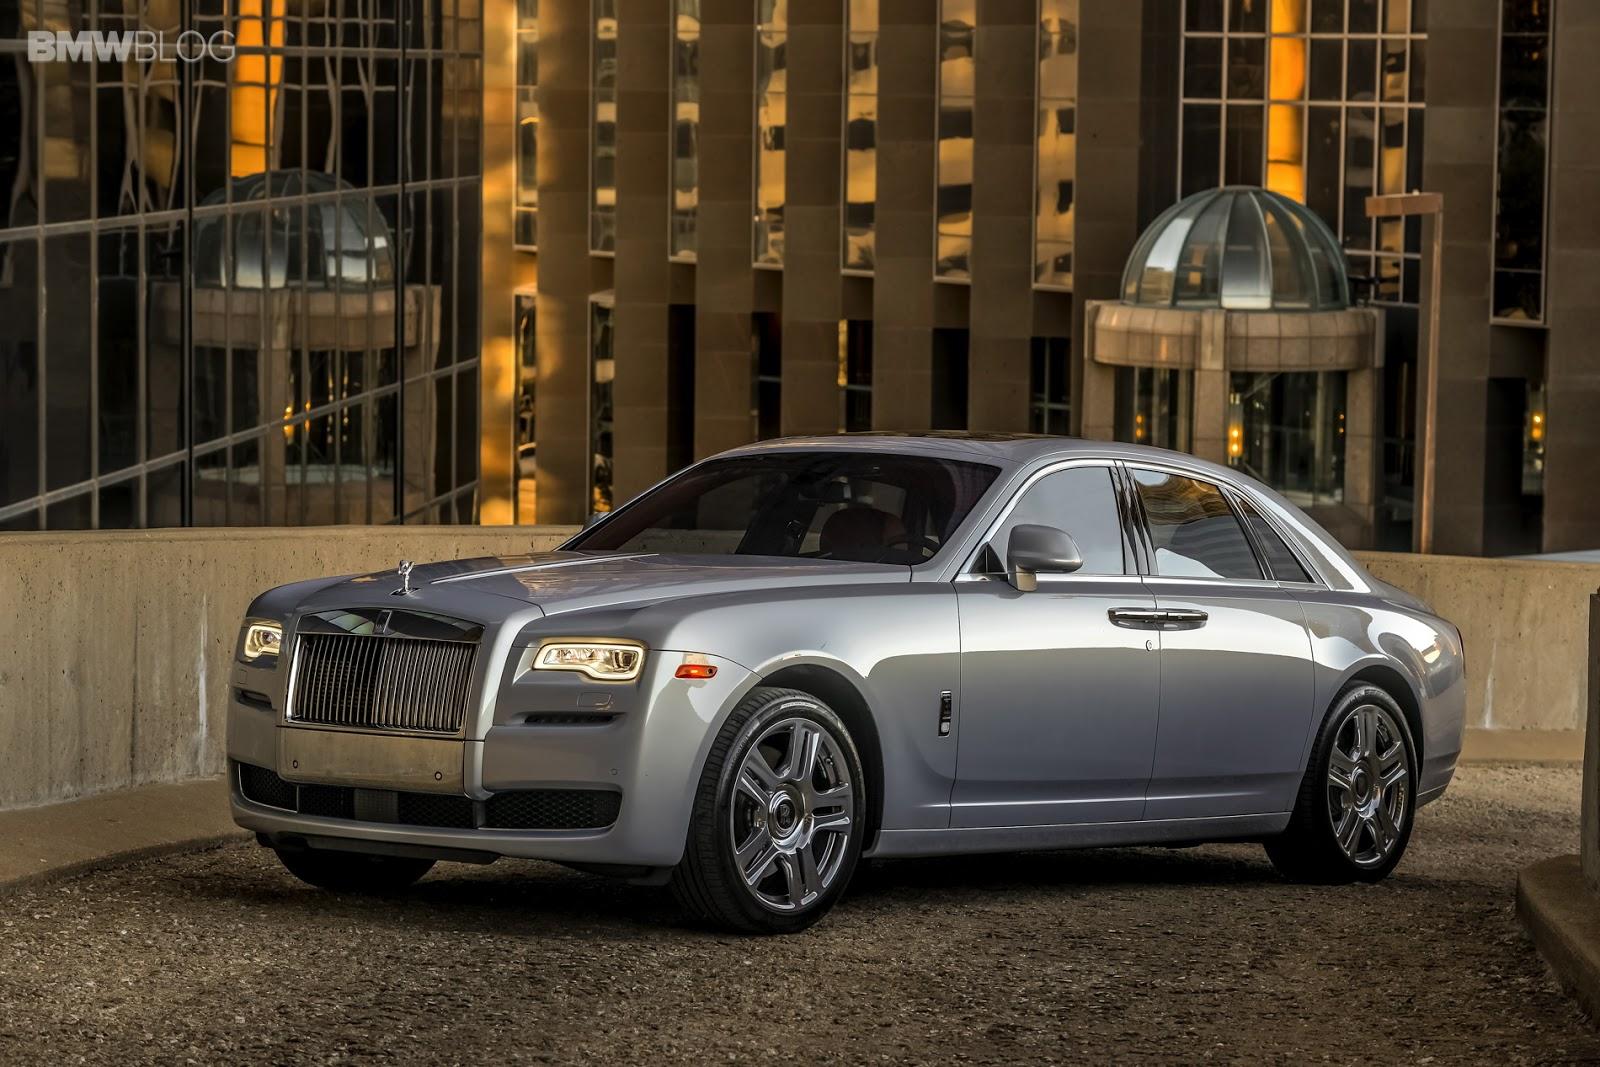 The World's 10 Best Luxury Cars - Universal Science Compendium